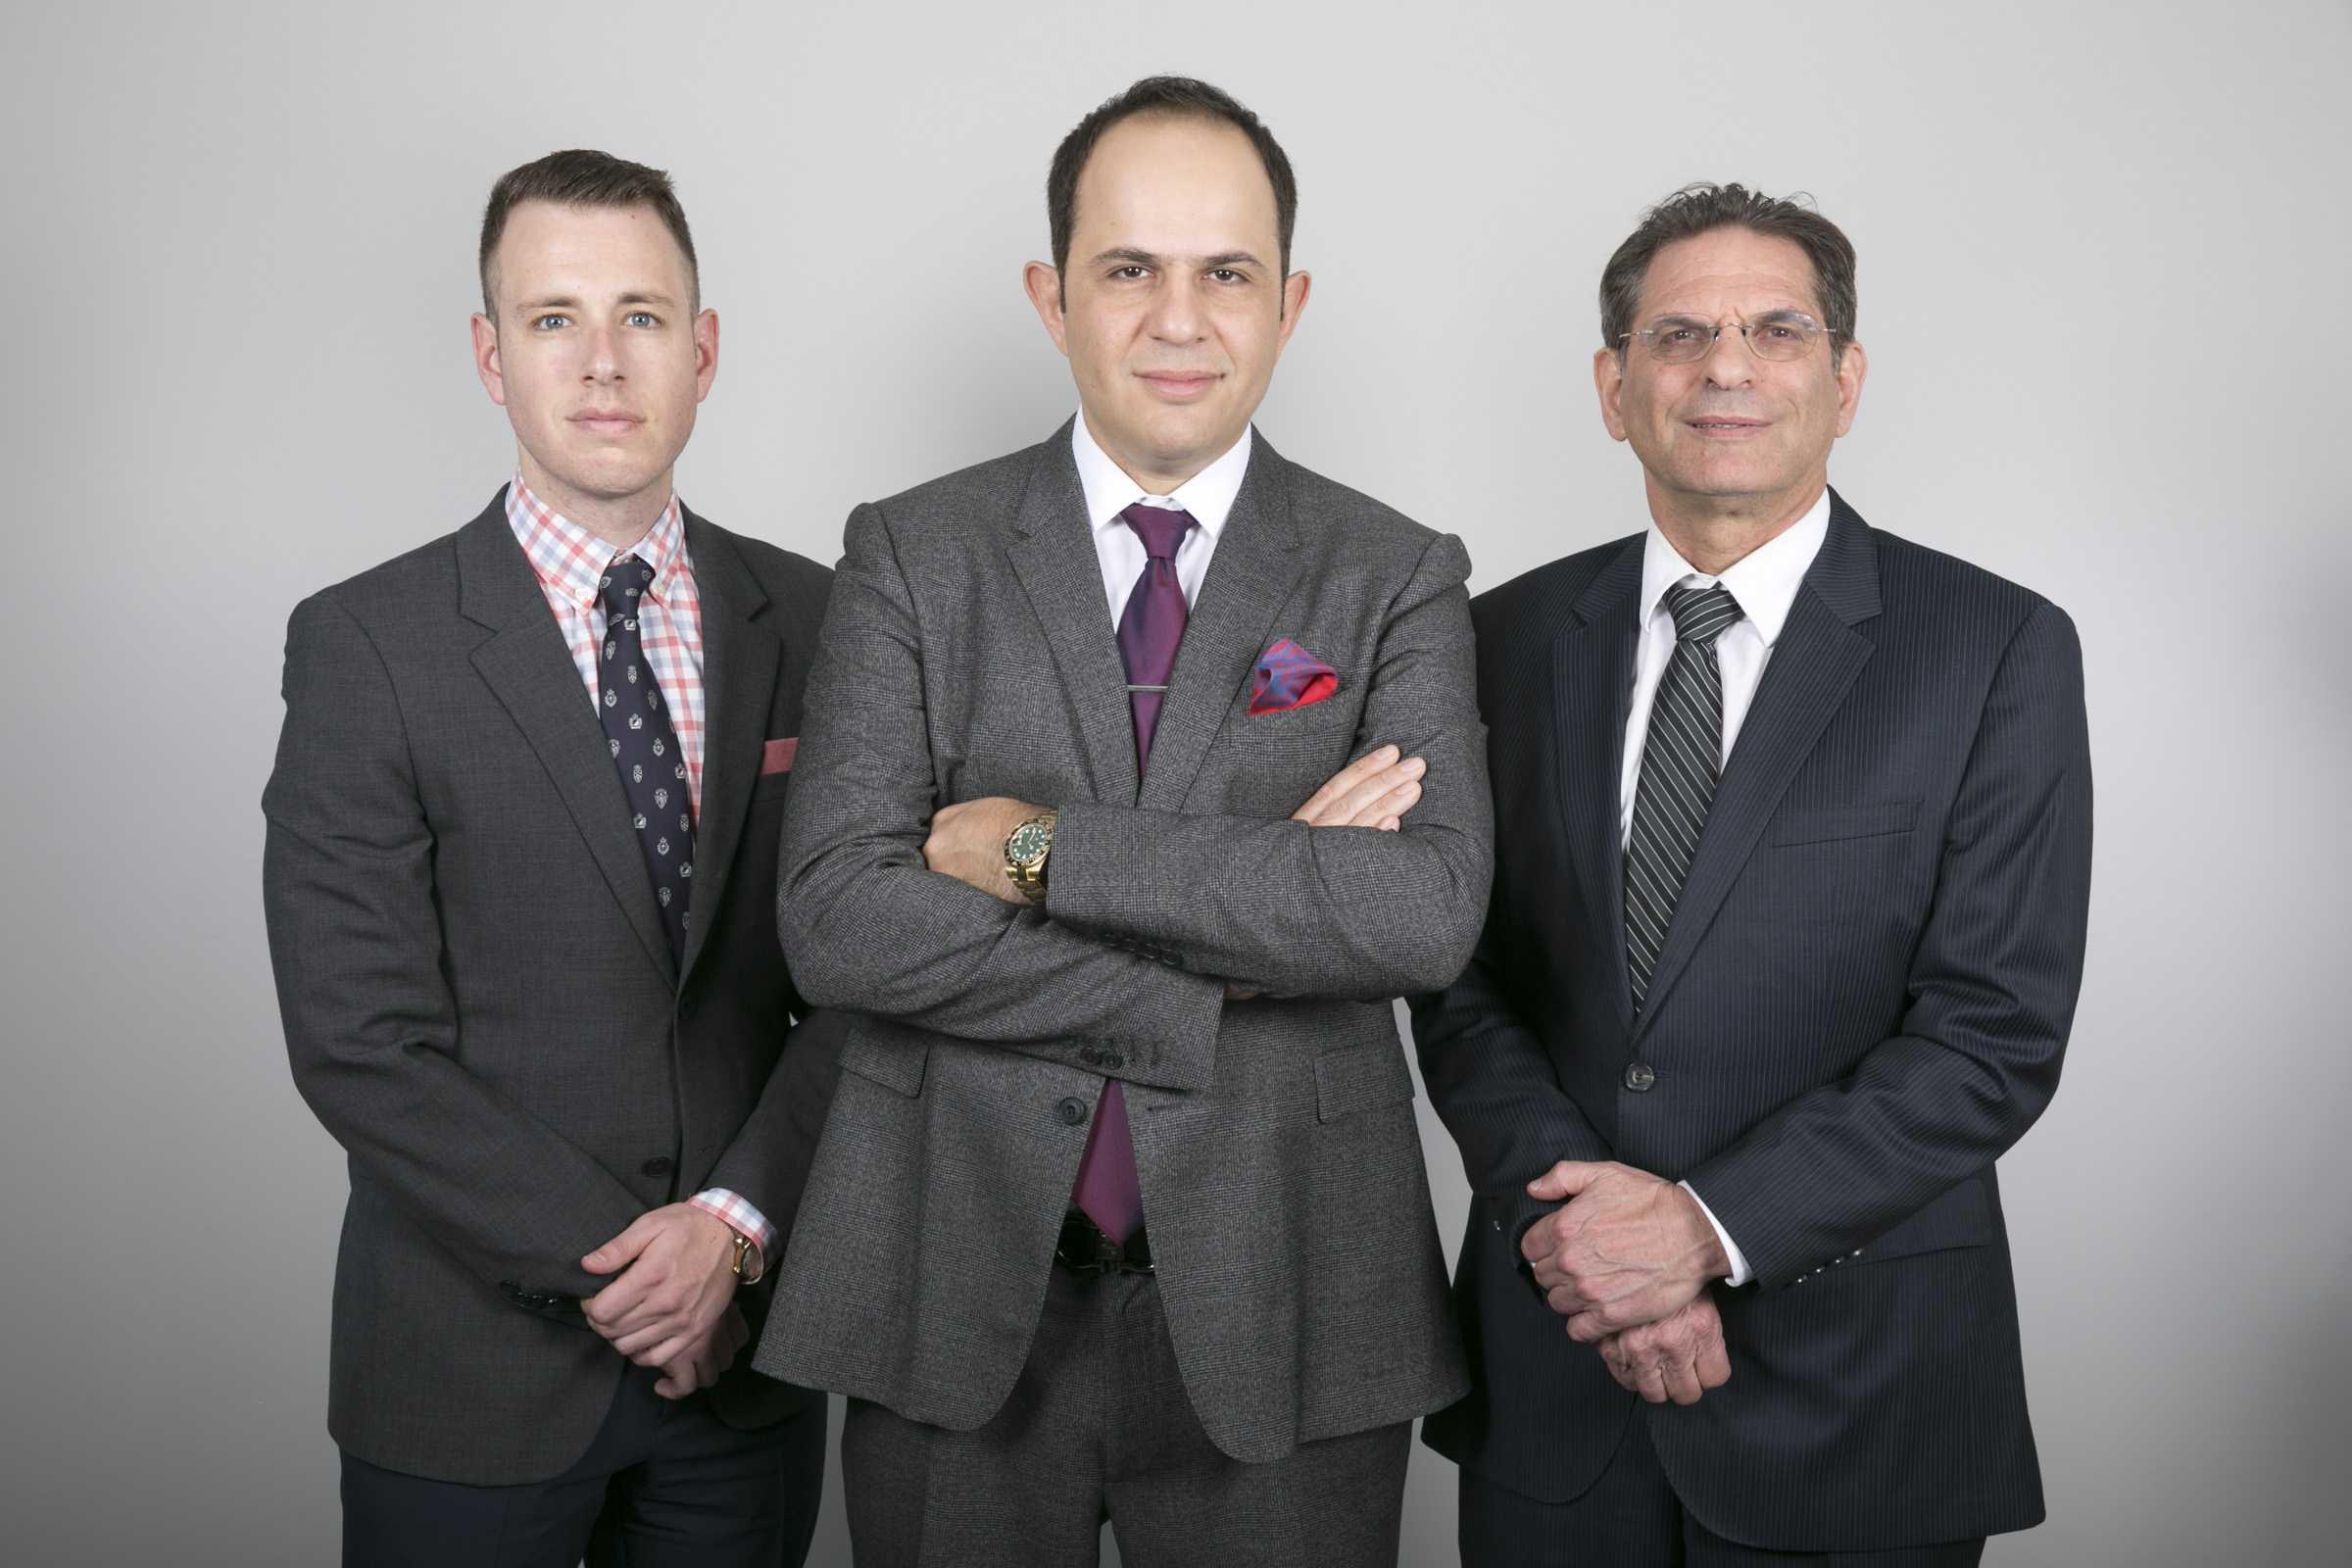 Partners Capital-0223 Final by Tedshots.com 2400px@80